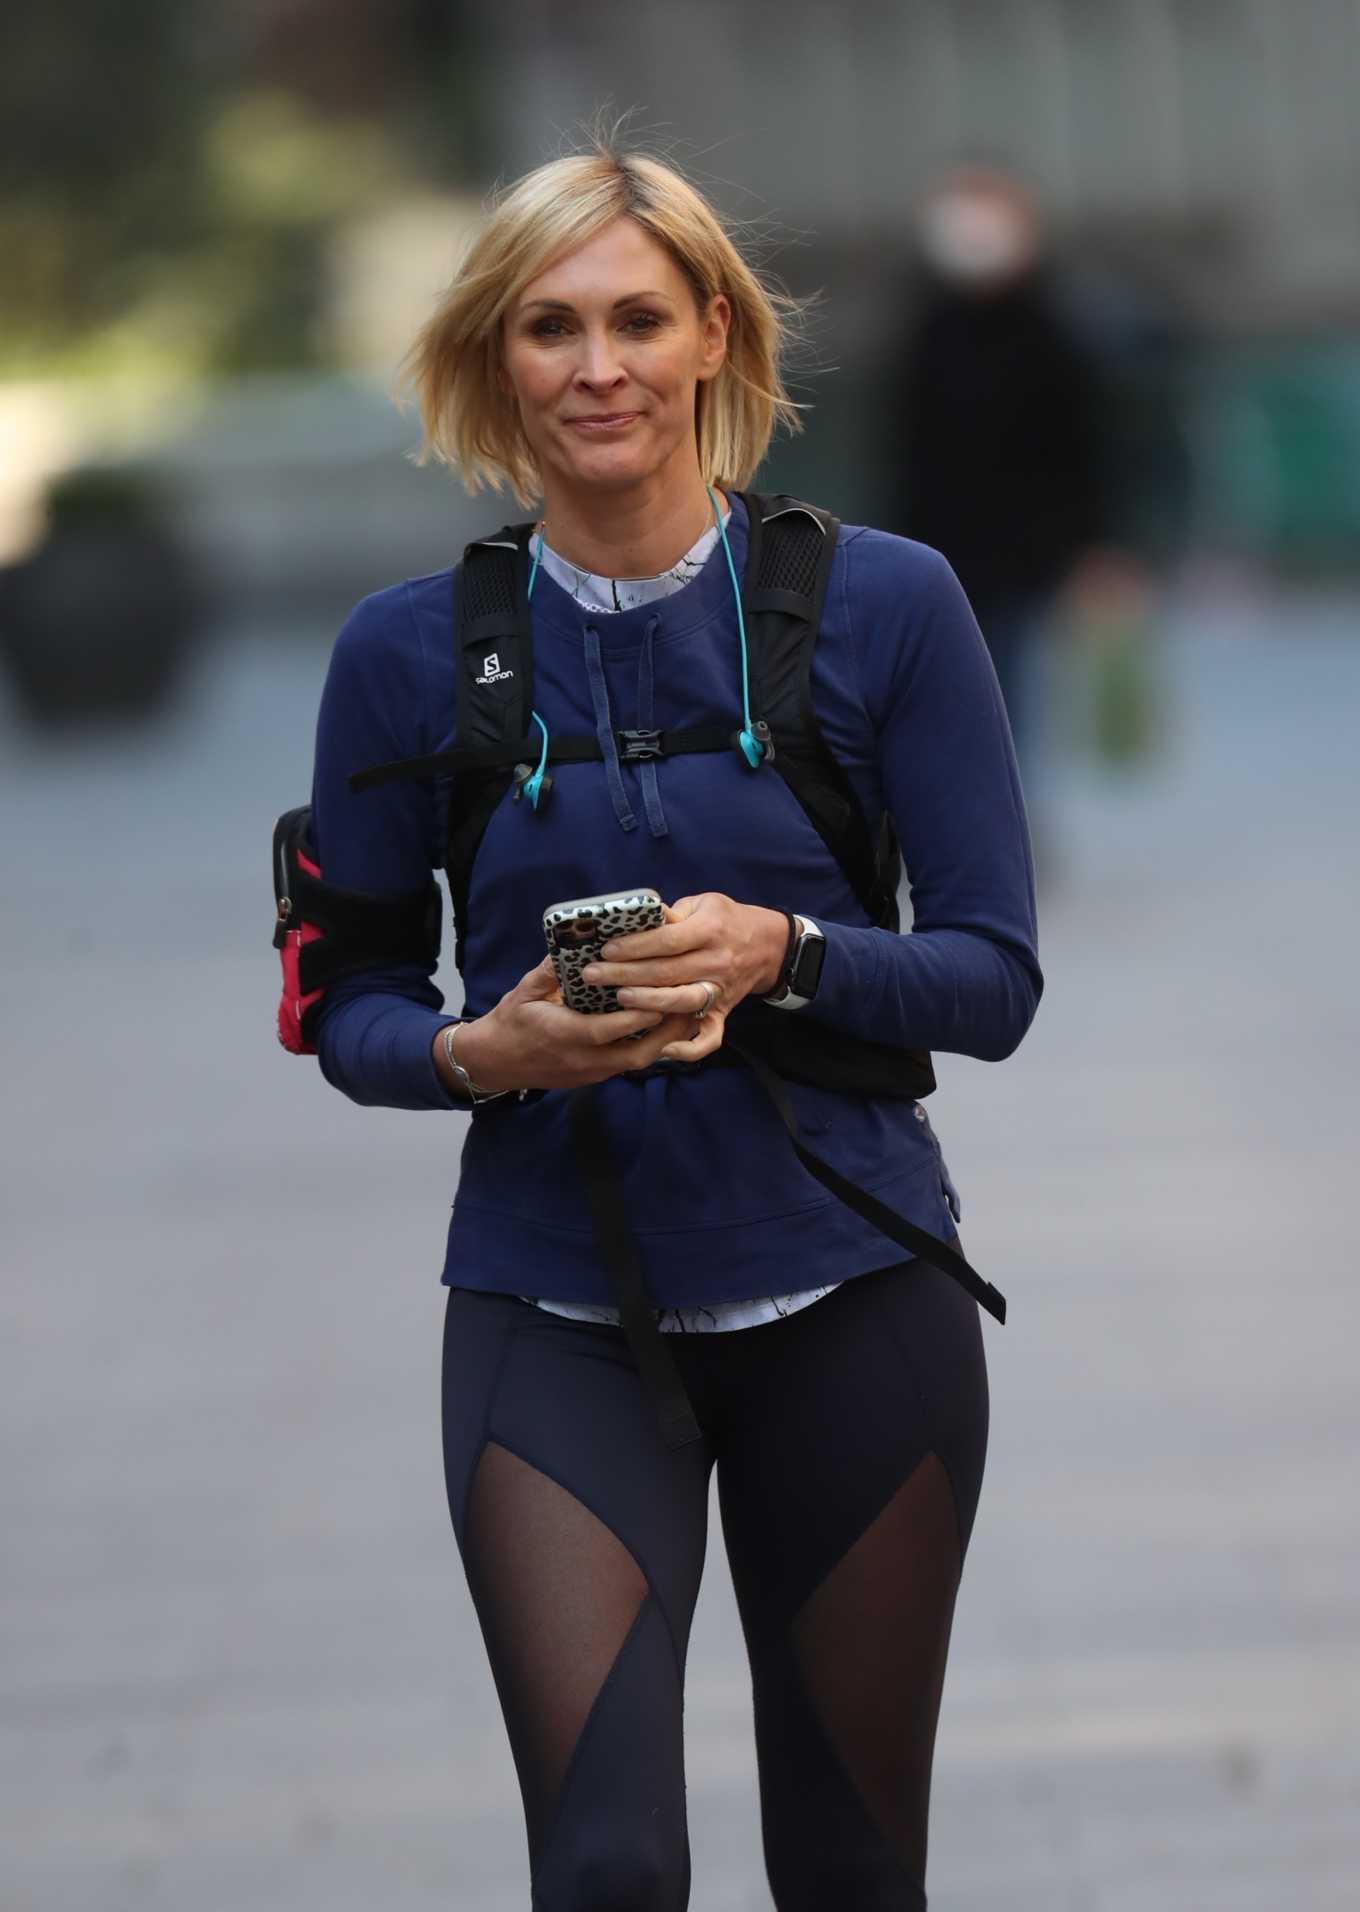 Jenni Falconer 2020 : Jenni Falconer in Tights – Goes for jog in London-02